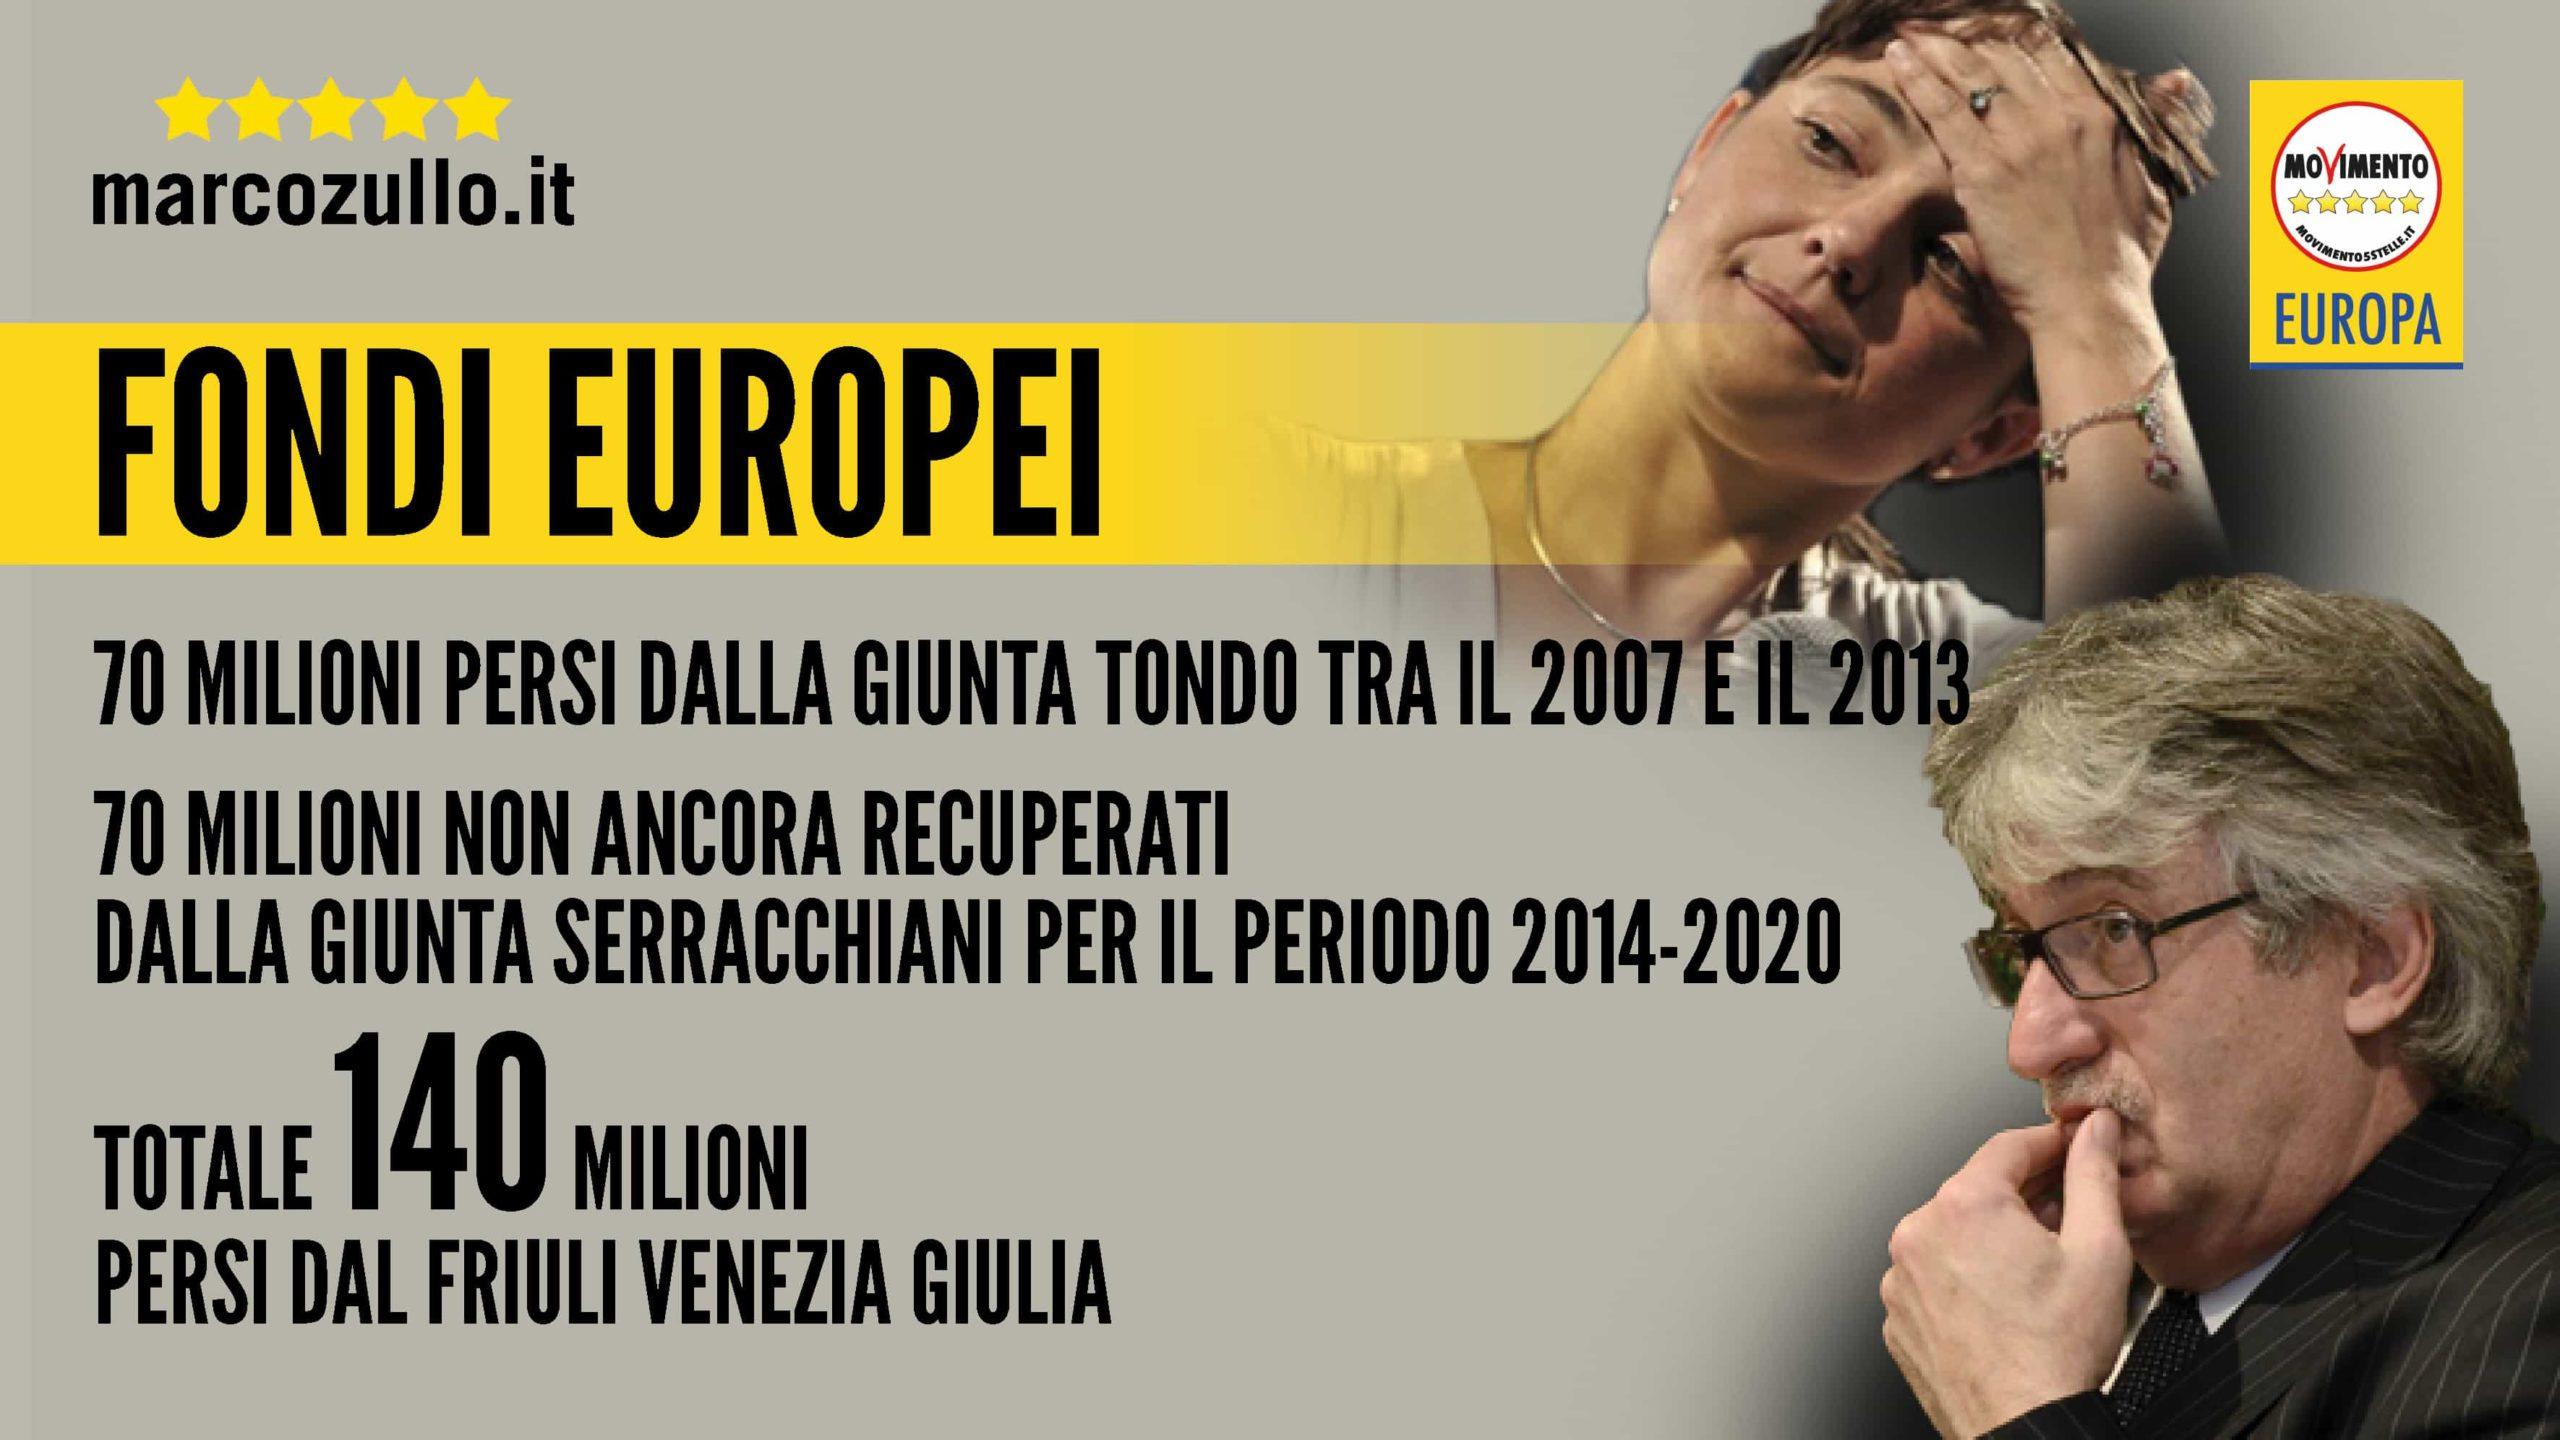 Marco Zullo M5S Europa fondi europei friuli serracchiani bolzonello tondo